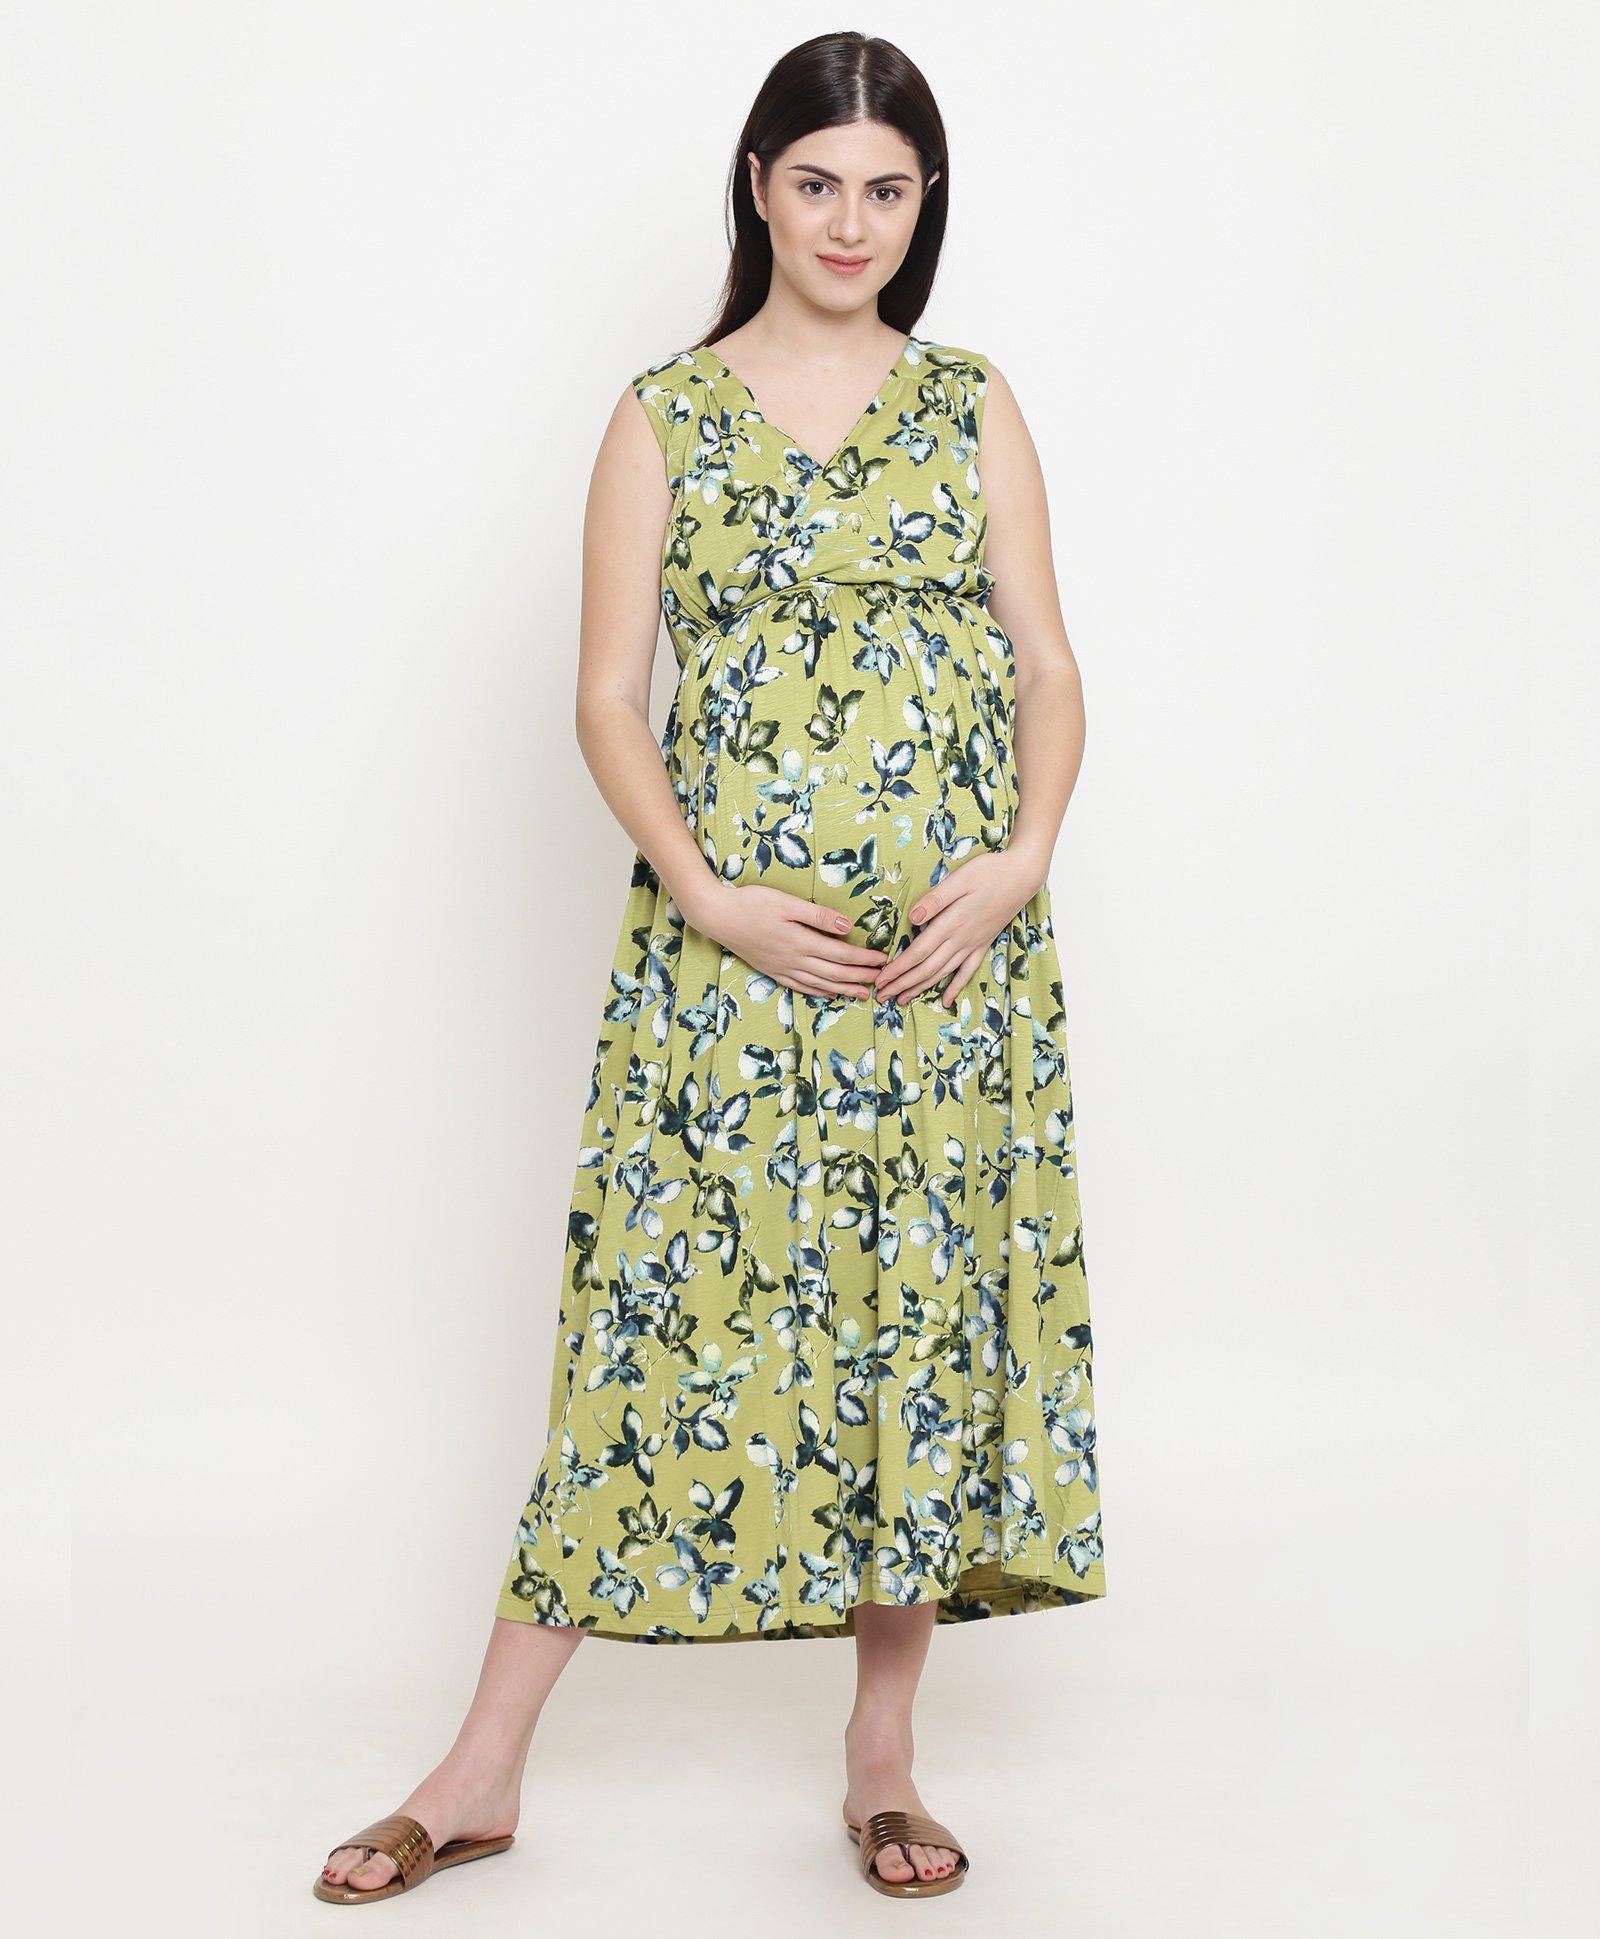 01f8b75510ad3e Fashionably Pregnant Leaves Print Sleeveless Maternity Maxi Dress - Green